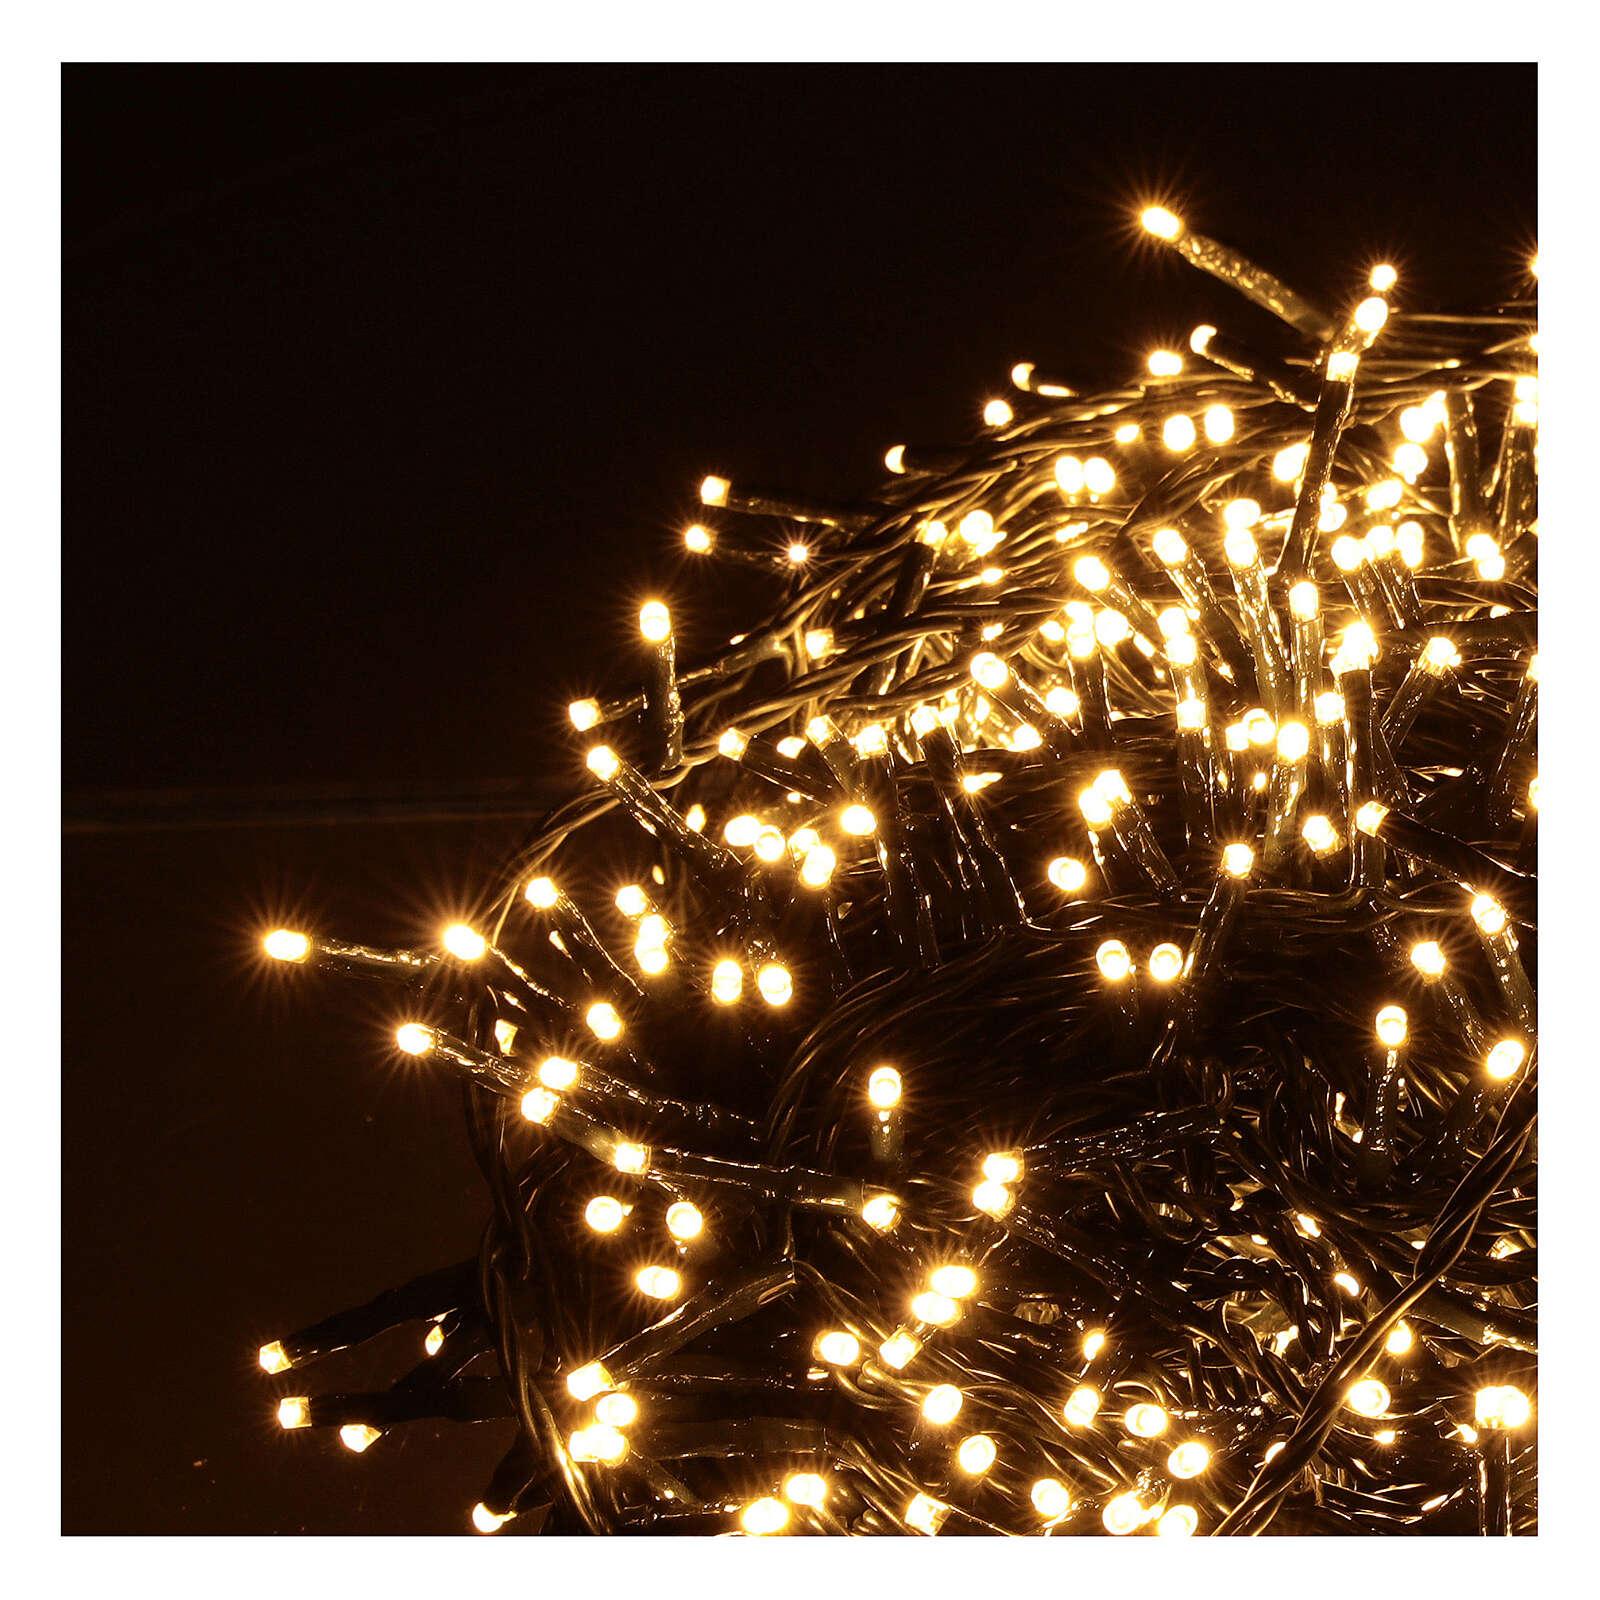 Christmas lights 1000 warm white LEDs external remote control 220V 3